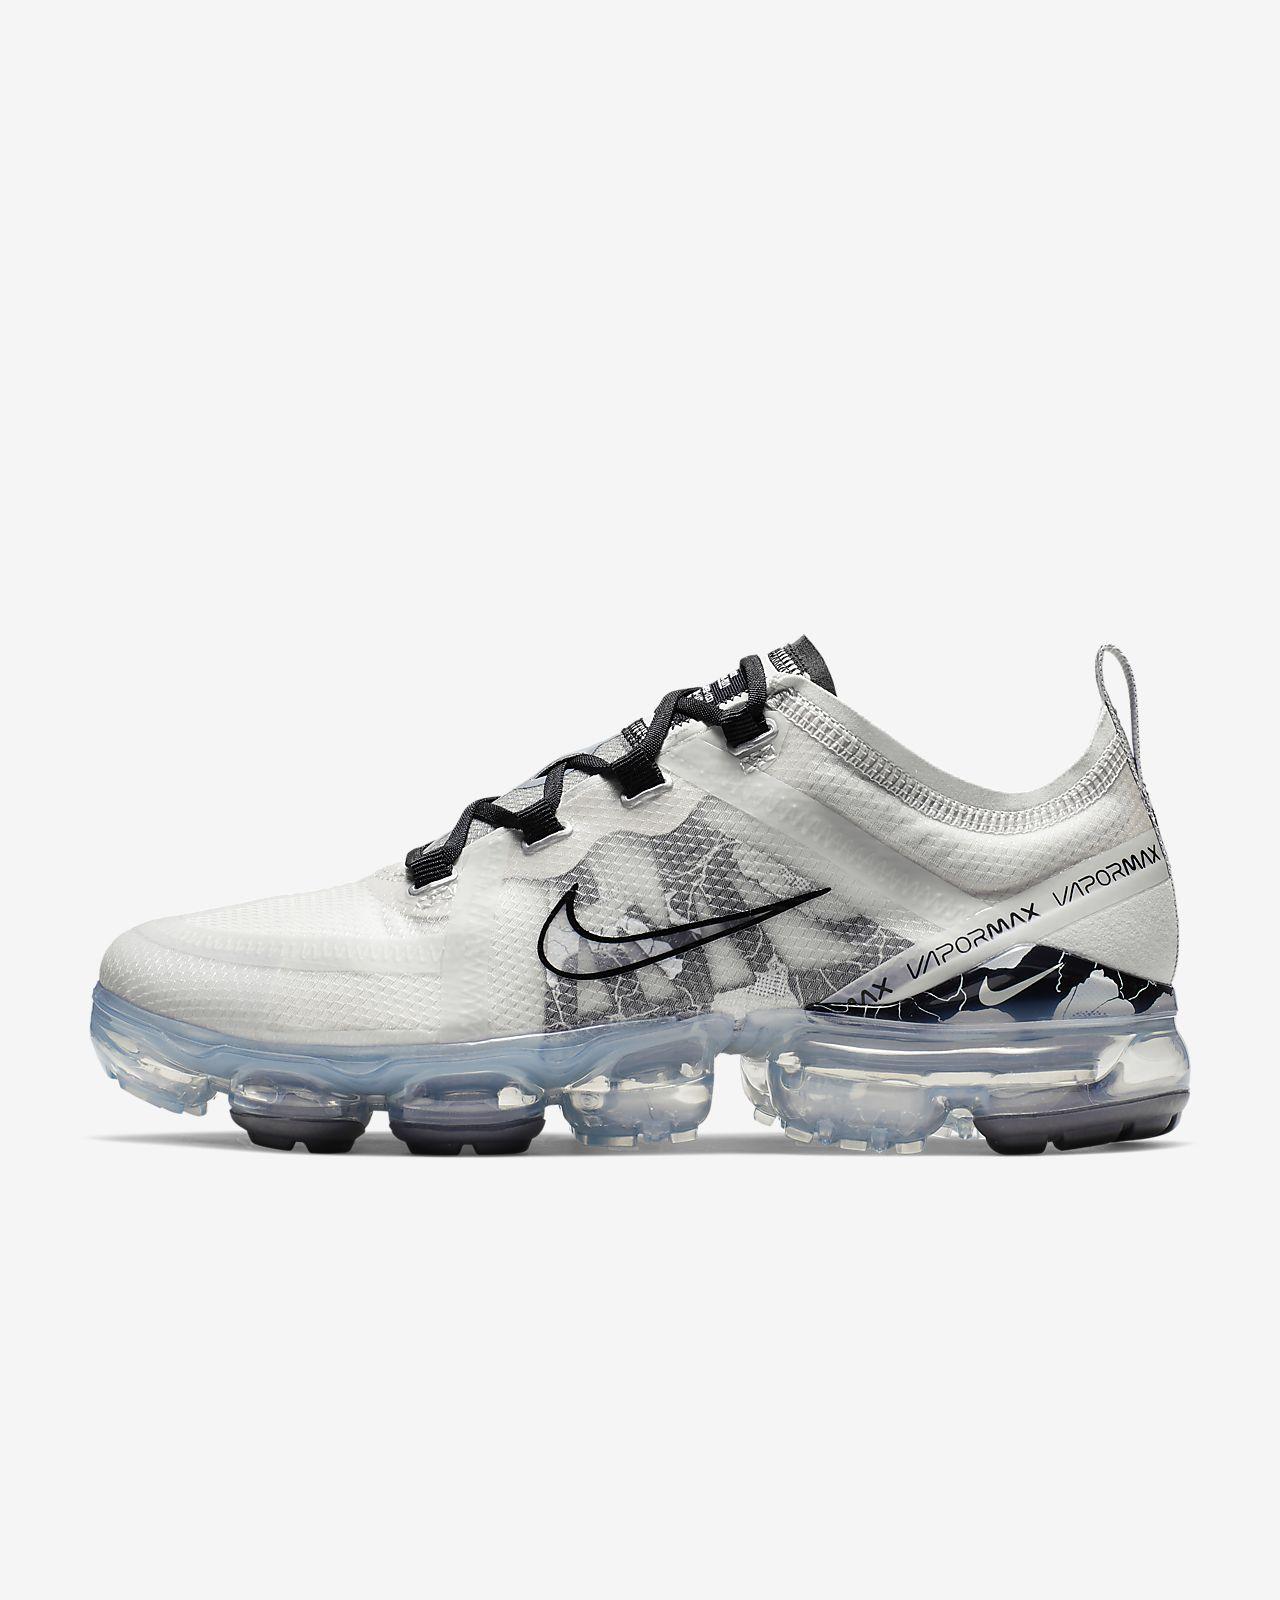 6e55b2717564 Nike Air VaporMax 2019 SE Women s Shoe. Nike.com